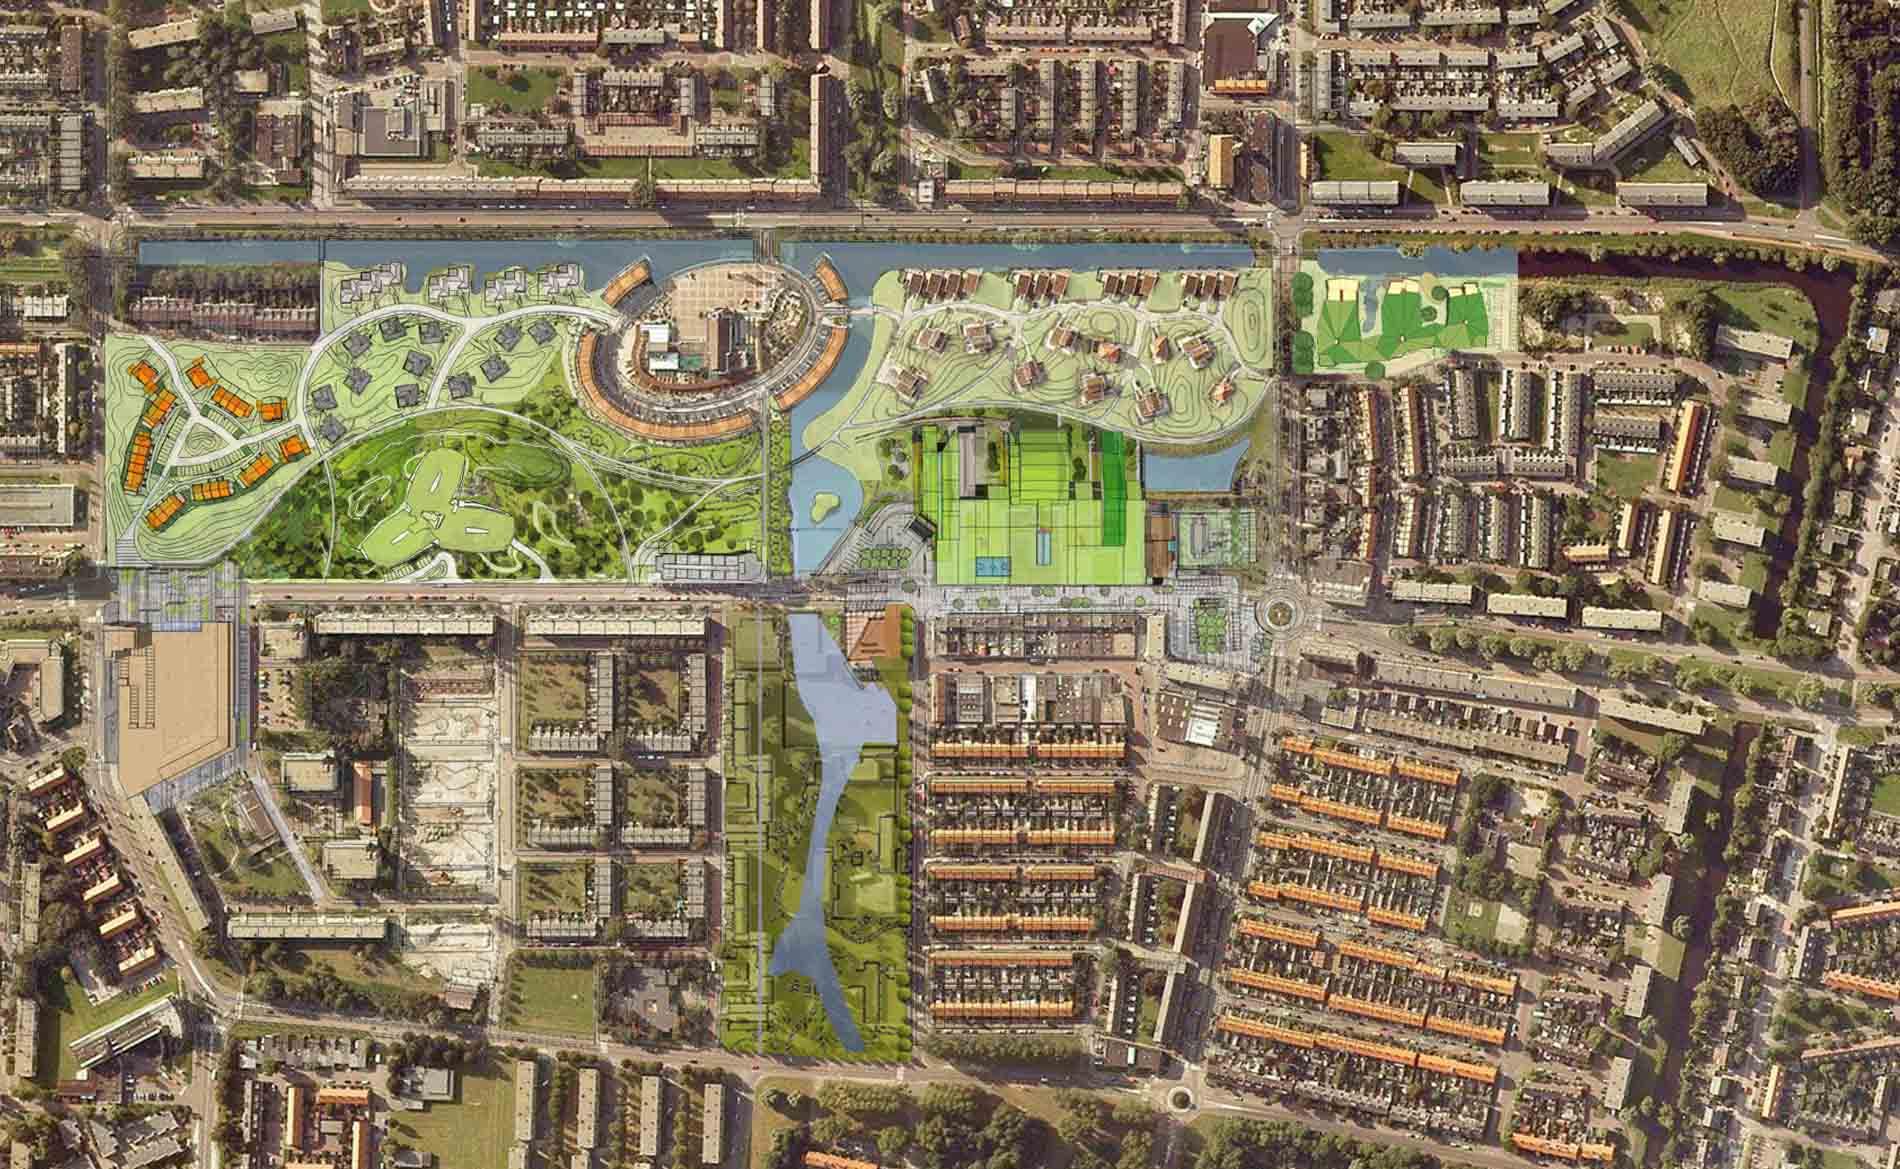 stedenbouw stedenbouwkundig ontwerp Duinpark Den Helder BBHD architecten